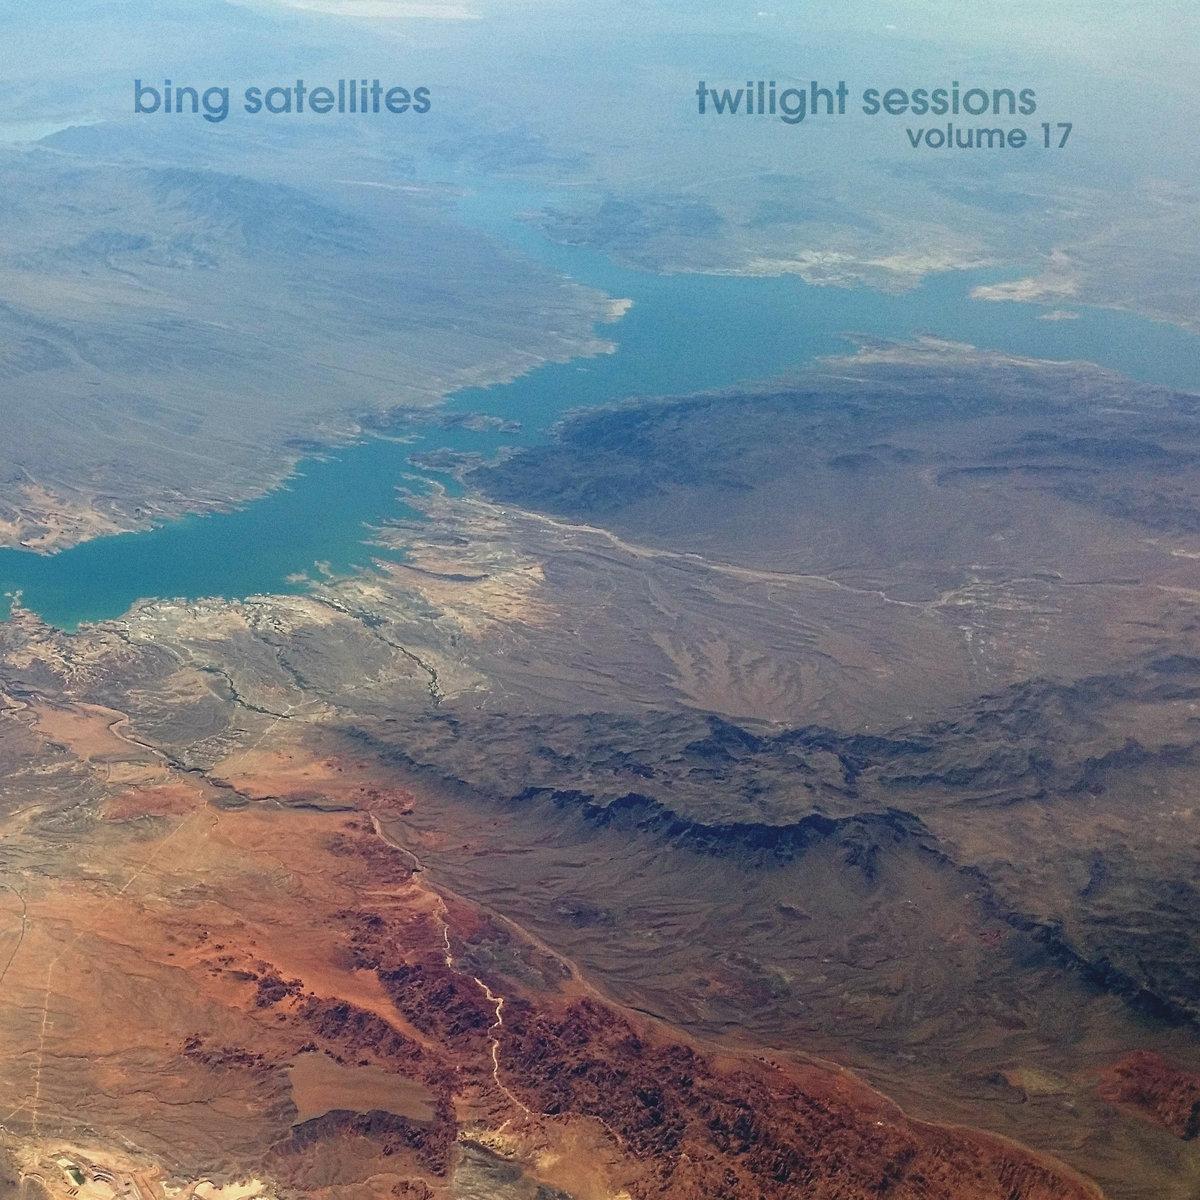 Bing Satellites: Twilight Sessions 17